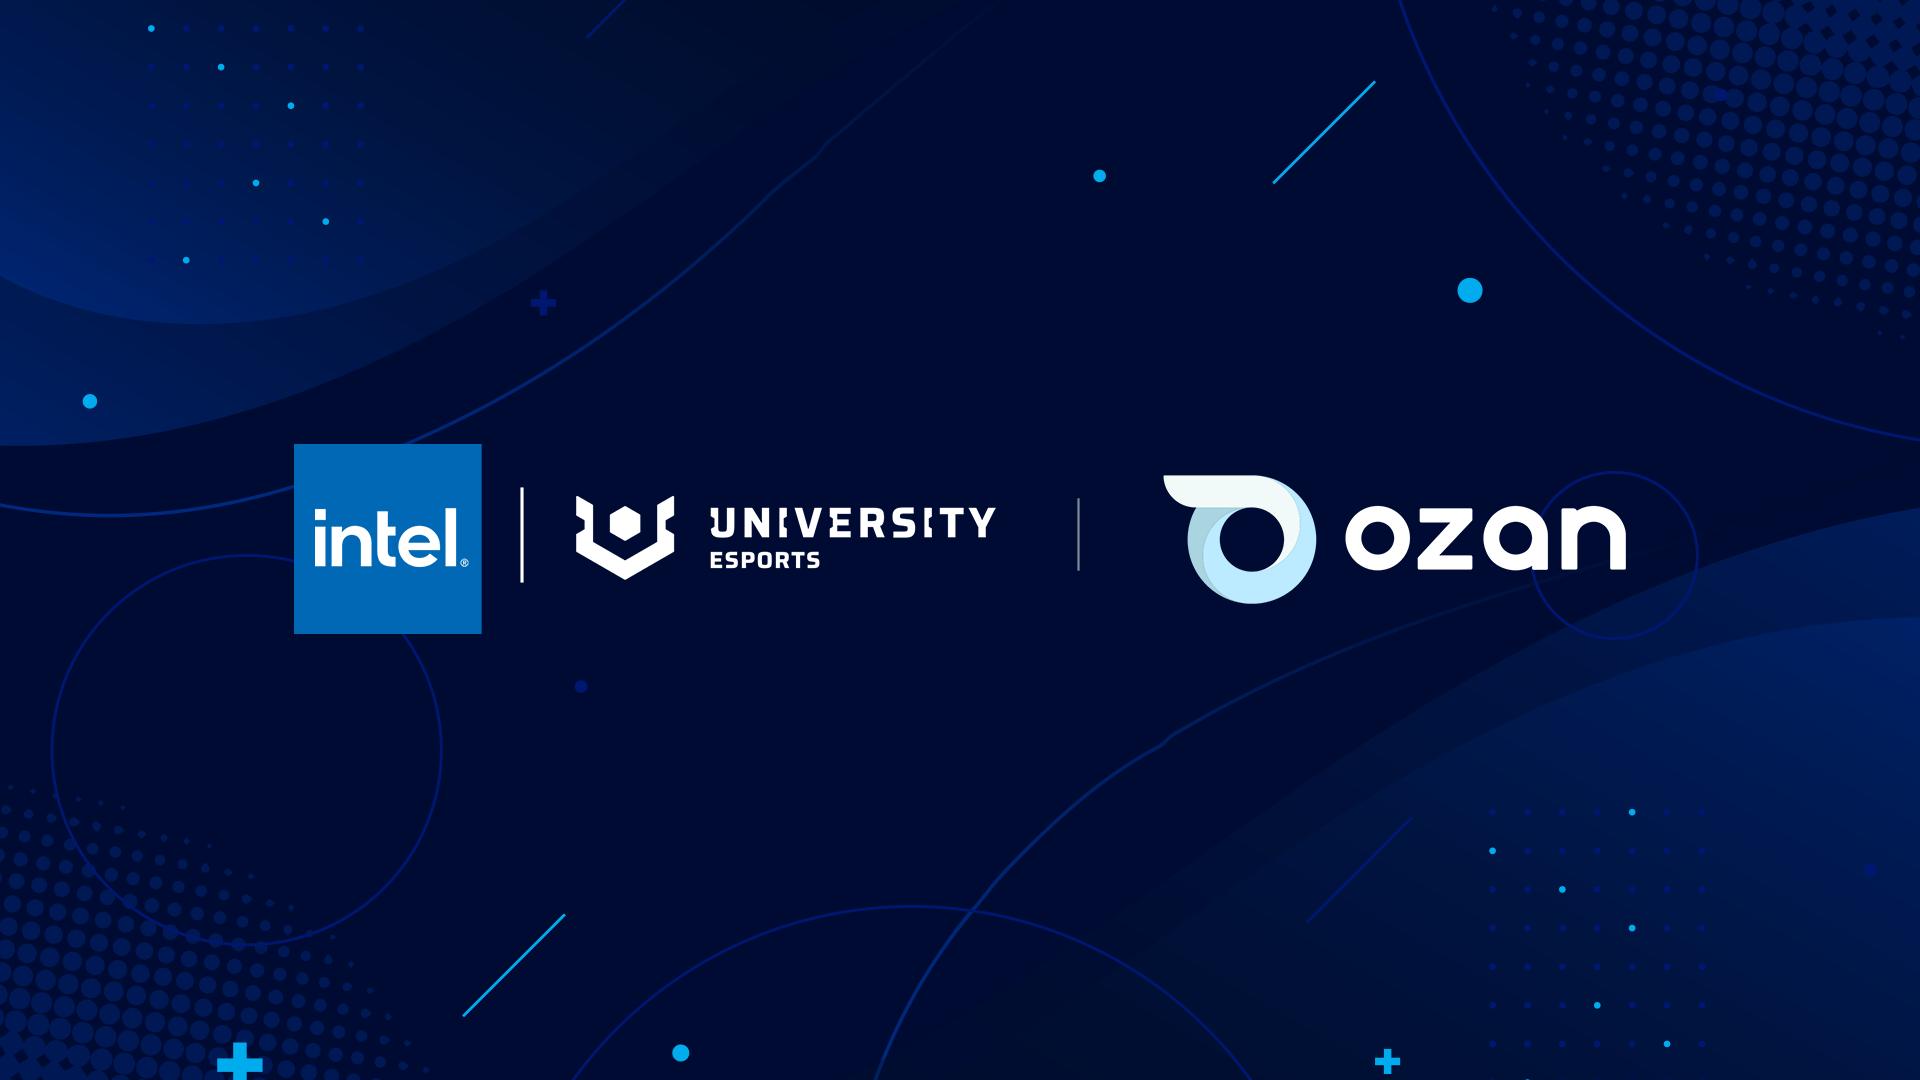 ozan-superapp-intel-university-esports-turkiyenin-100-000-tllik-odul-sponsoru-oldu (1)